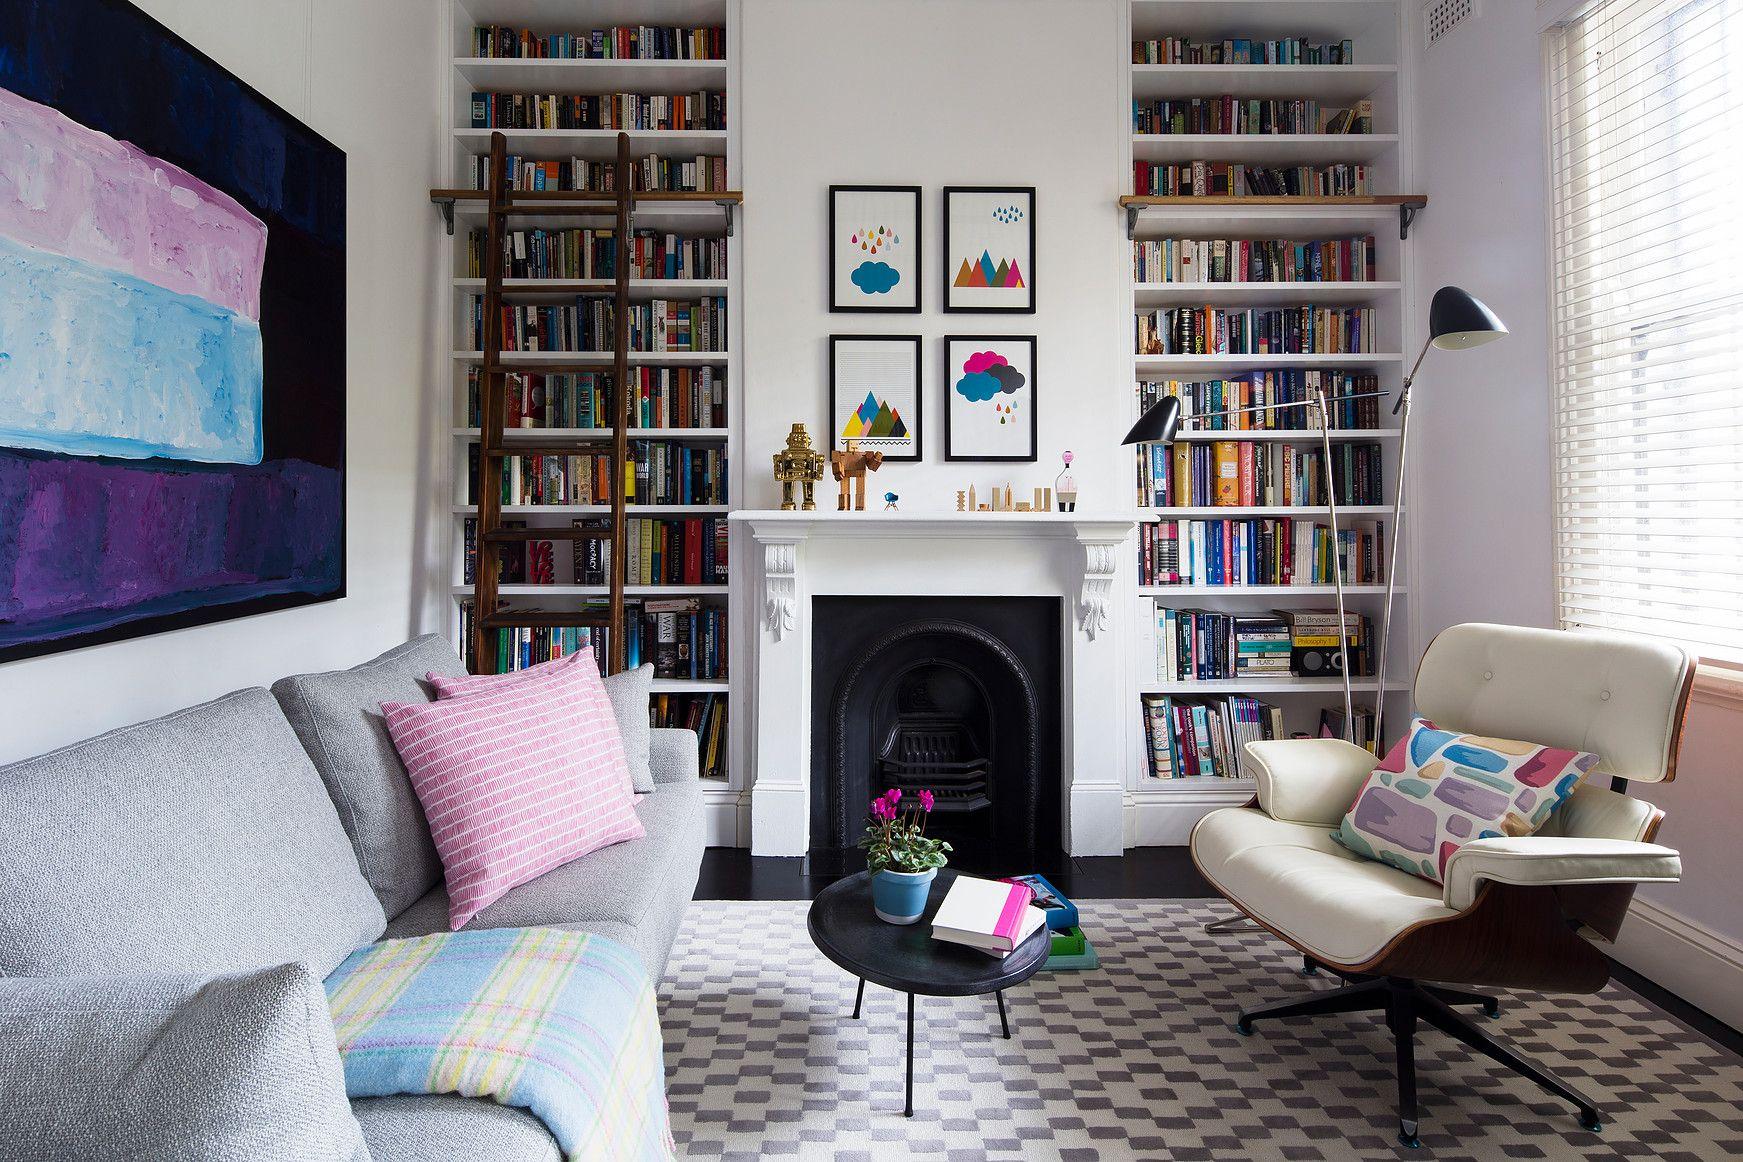 Interior Designer Newcastle Residential Eclectic Living Room Eclectic Living Room Design Living Room Inspiration